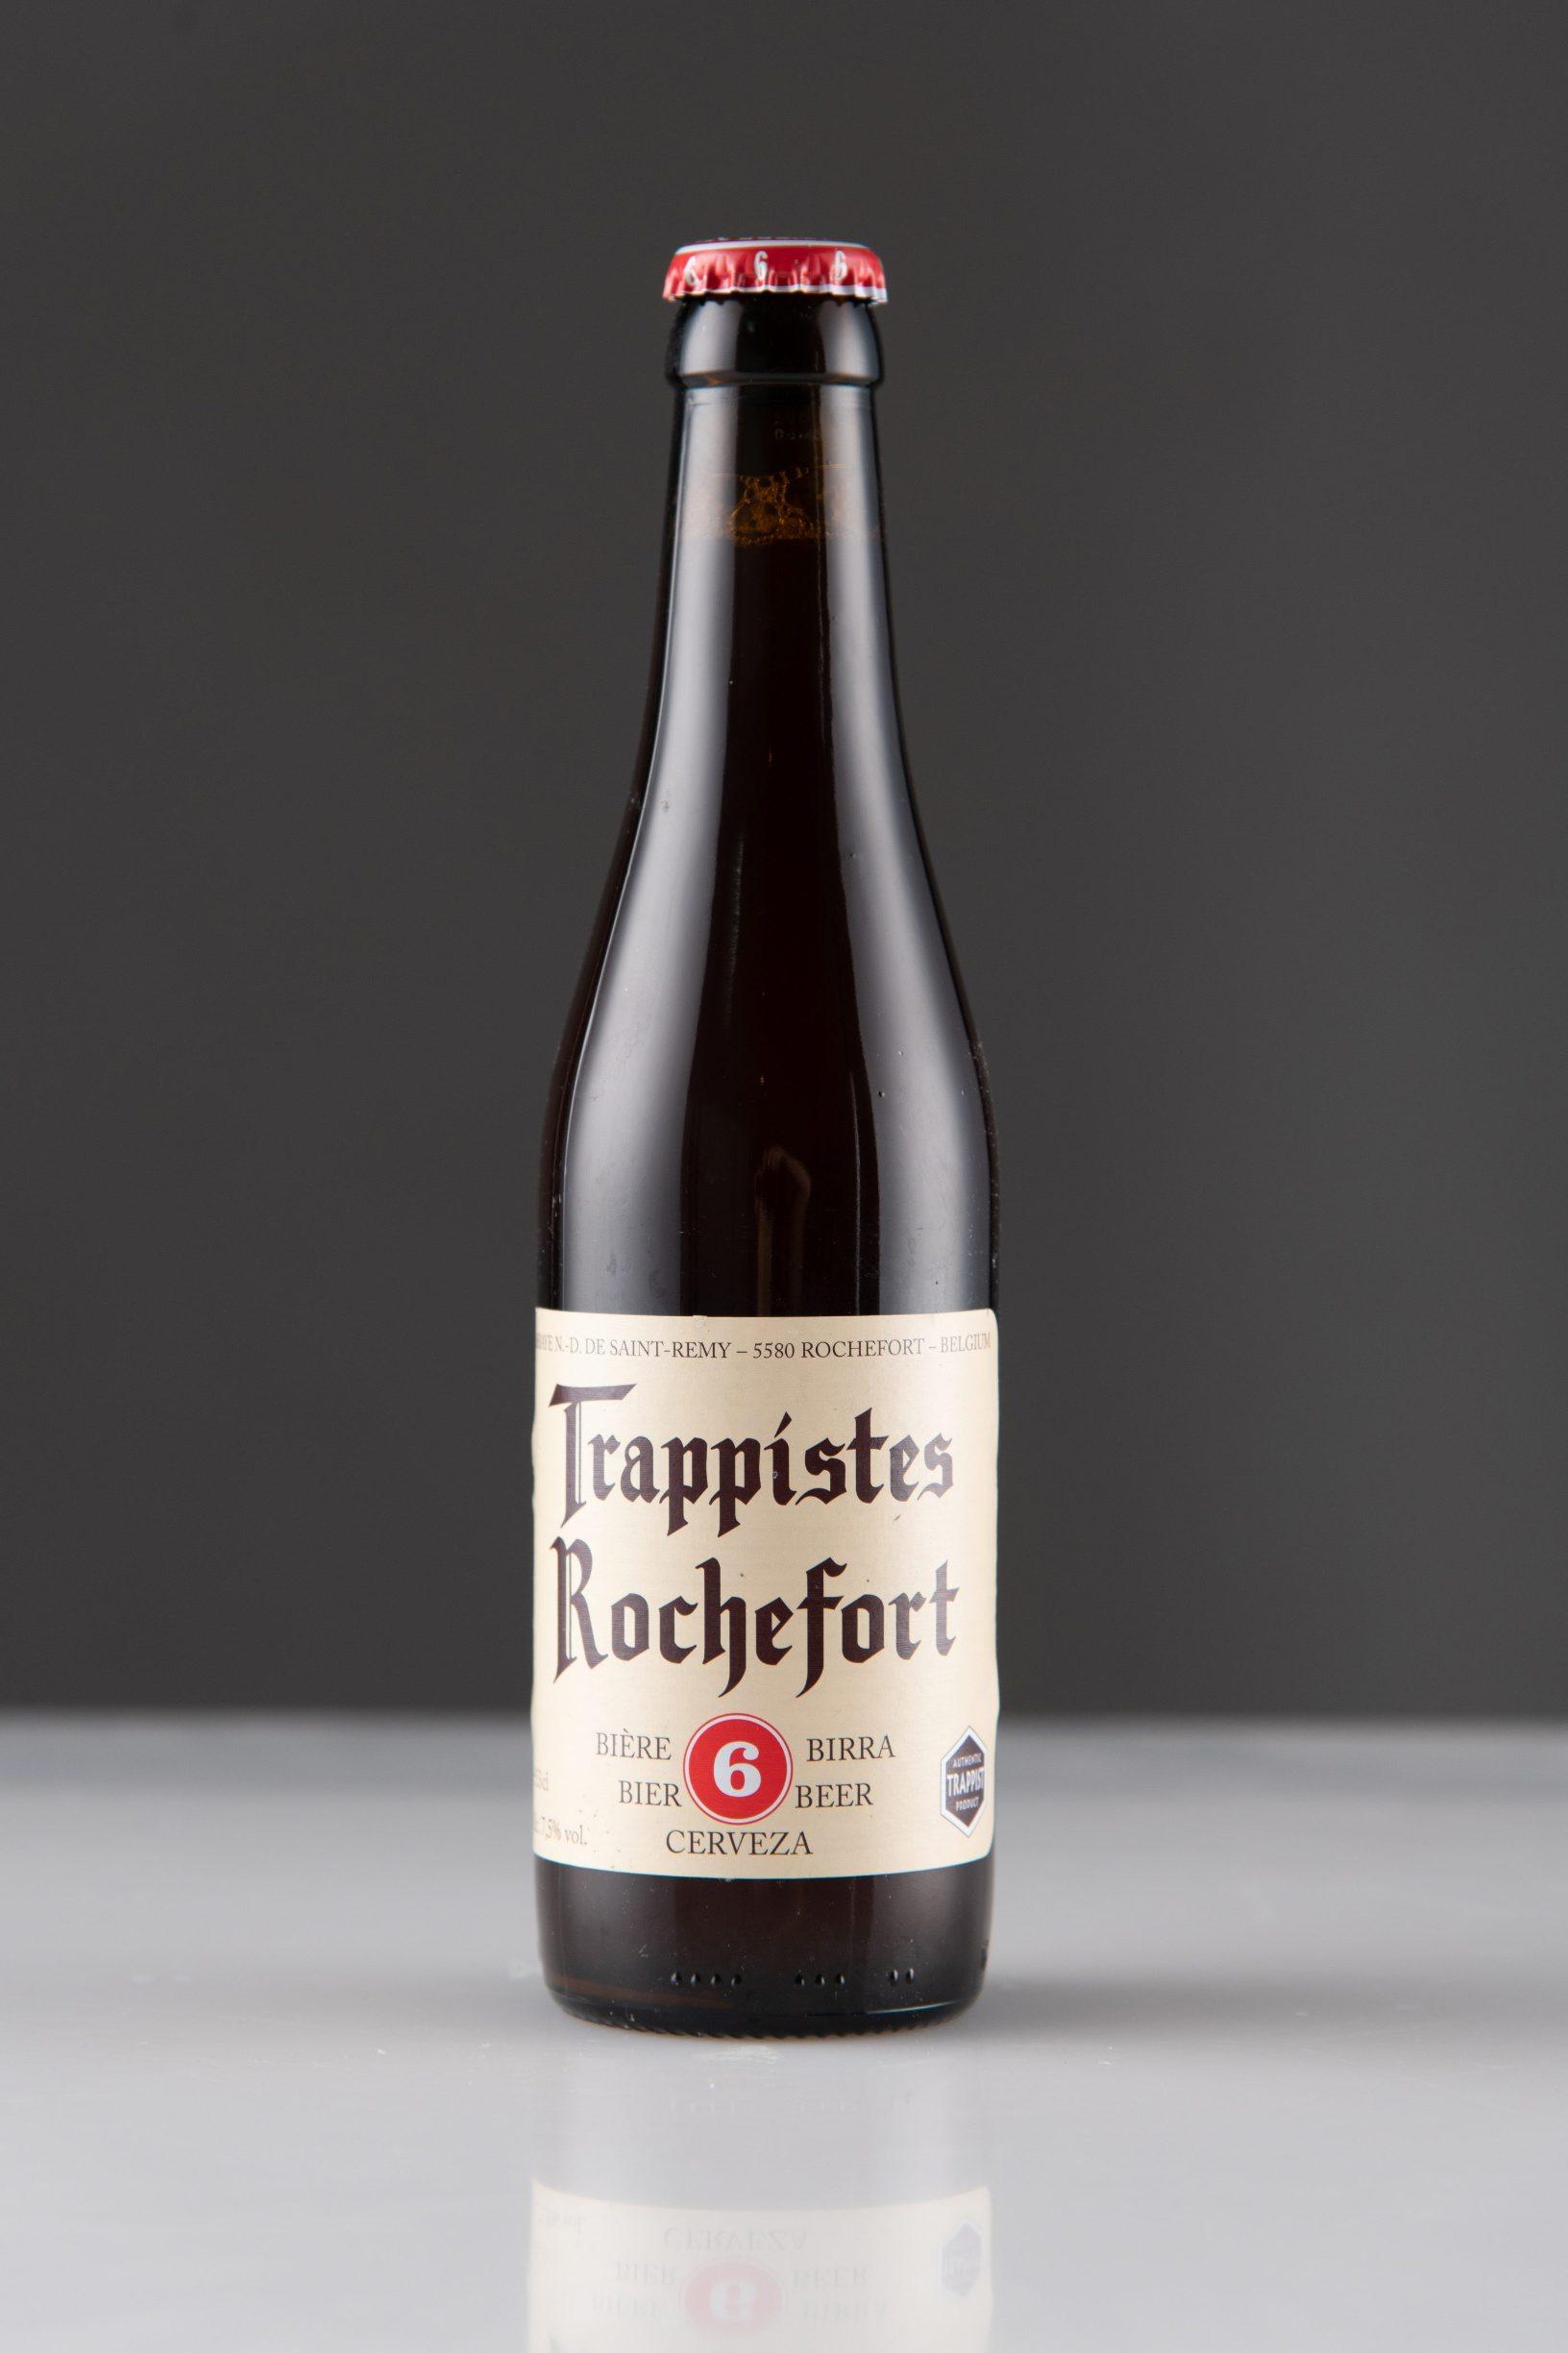 Zagreb, 241119 Test bozicnih tamnih piva. Na slici je: Trappistes rochefort pivo. Foto: Marko Miscevic / Cropix